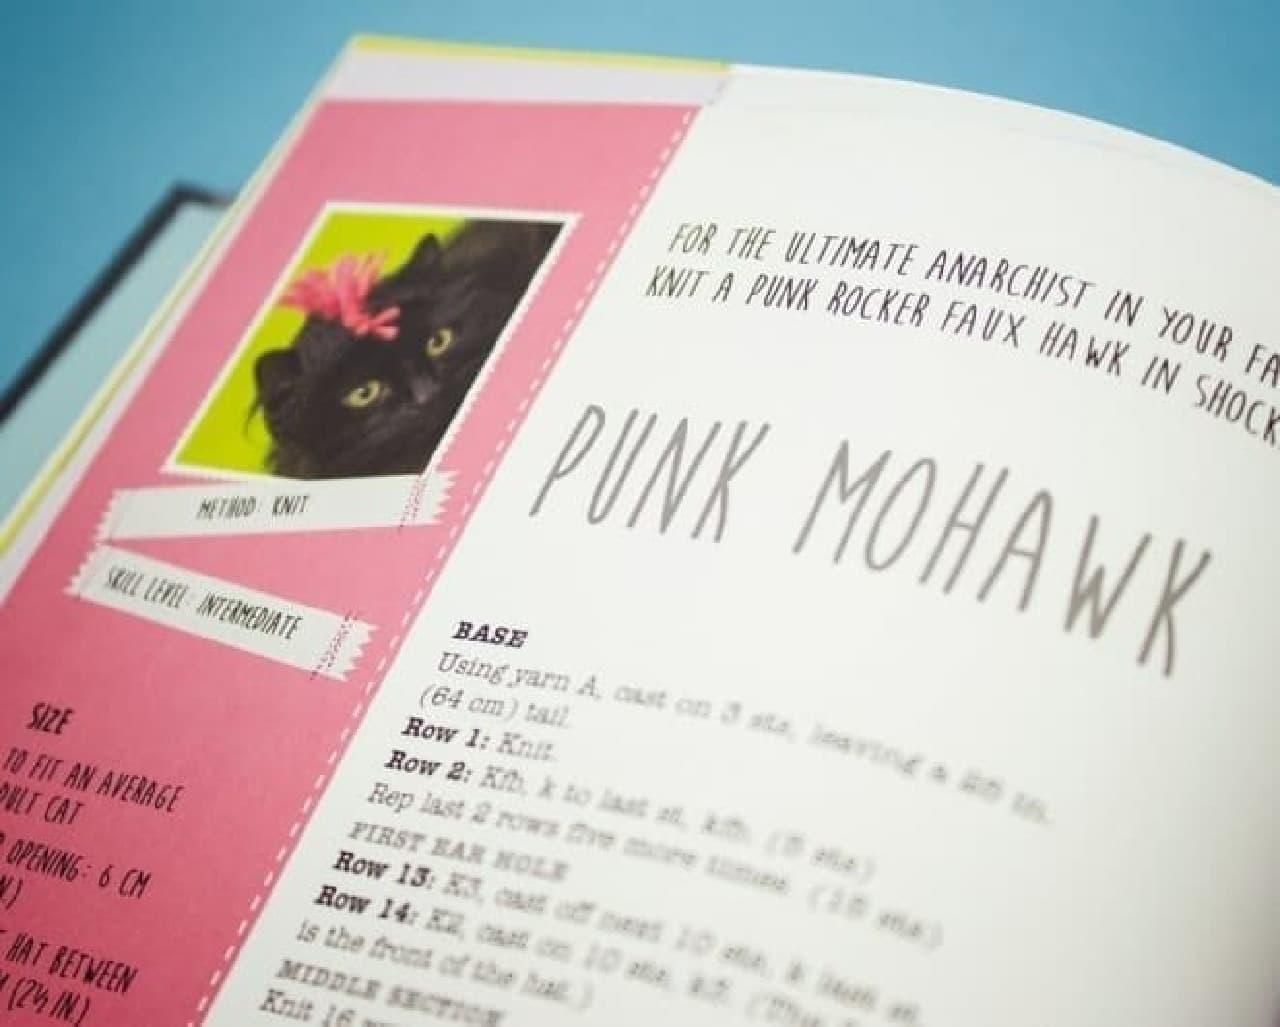 「PUNK MOHAWK」は、「モヒカン刈り」くらいの感じニャ